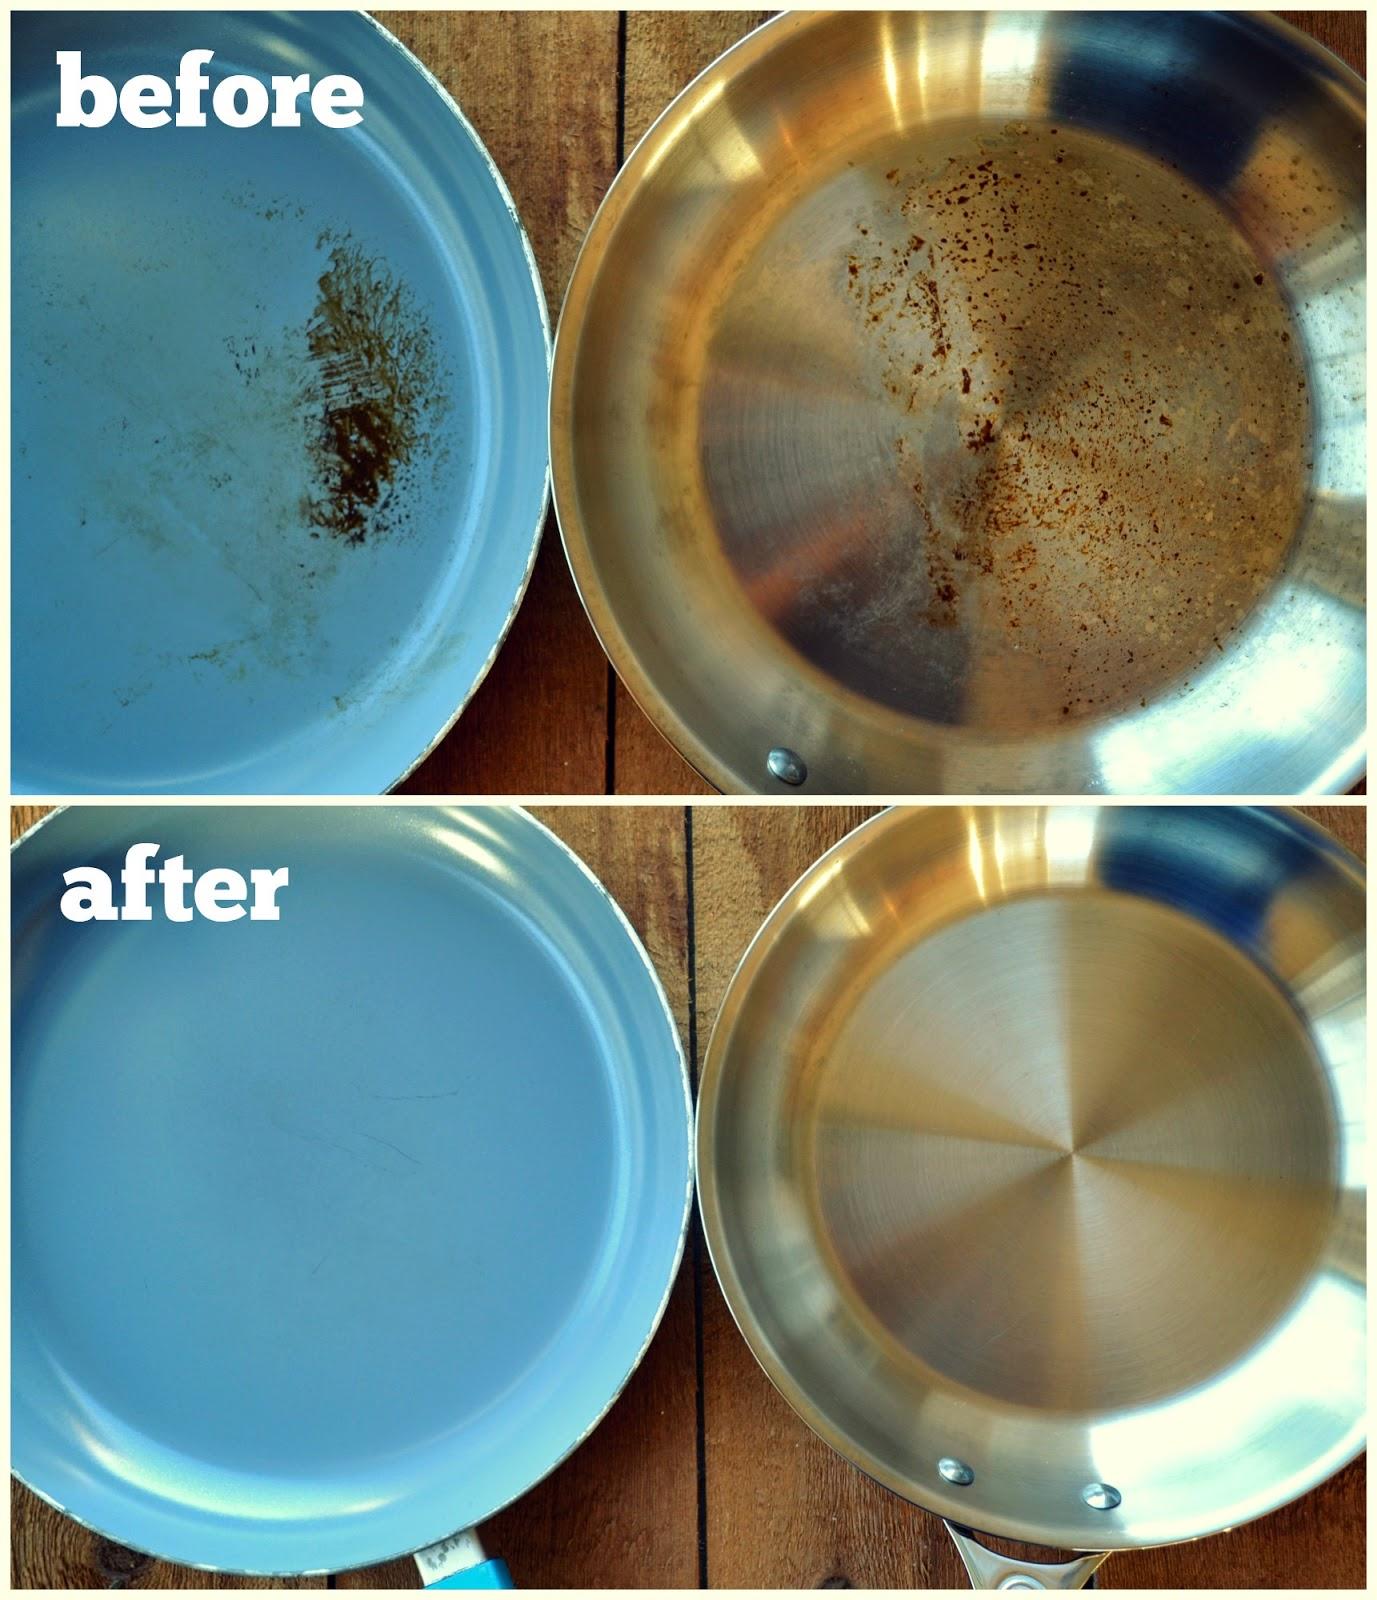 Family Feedbag Make Pots And Pans Look